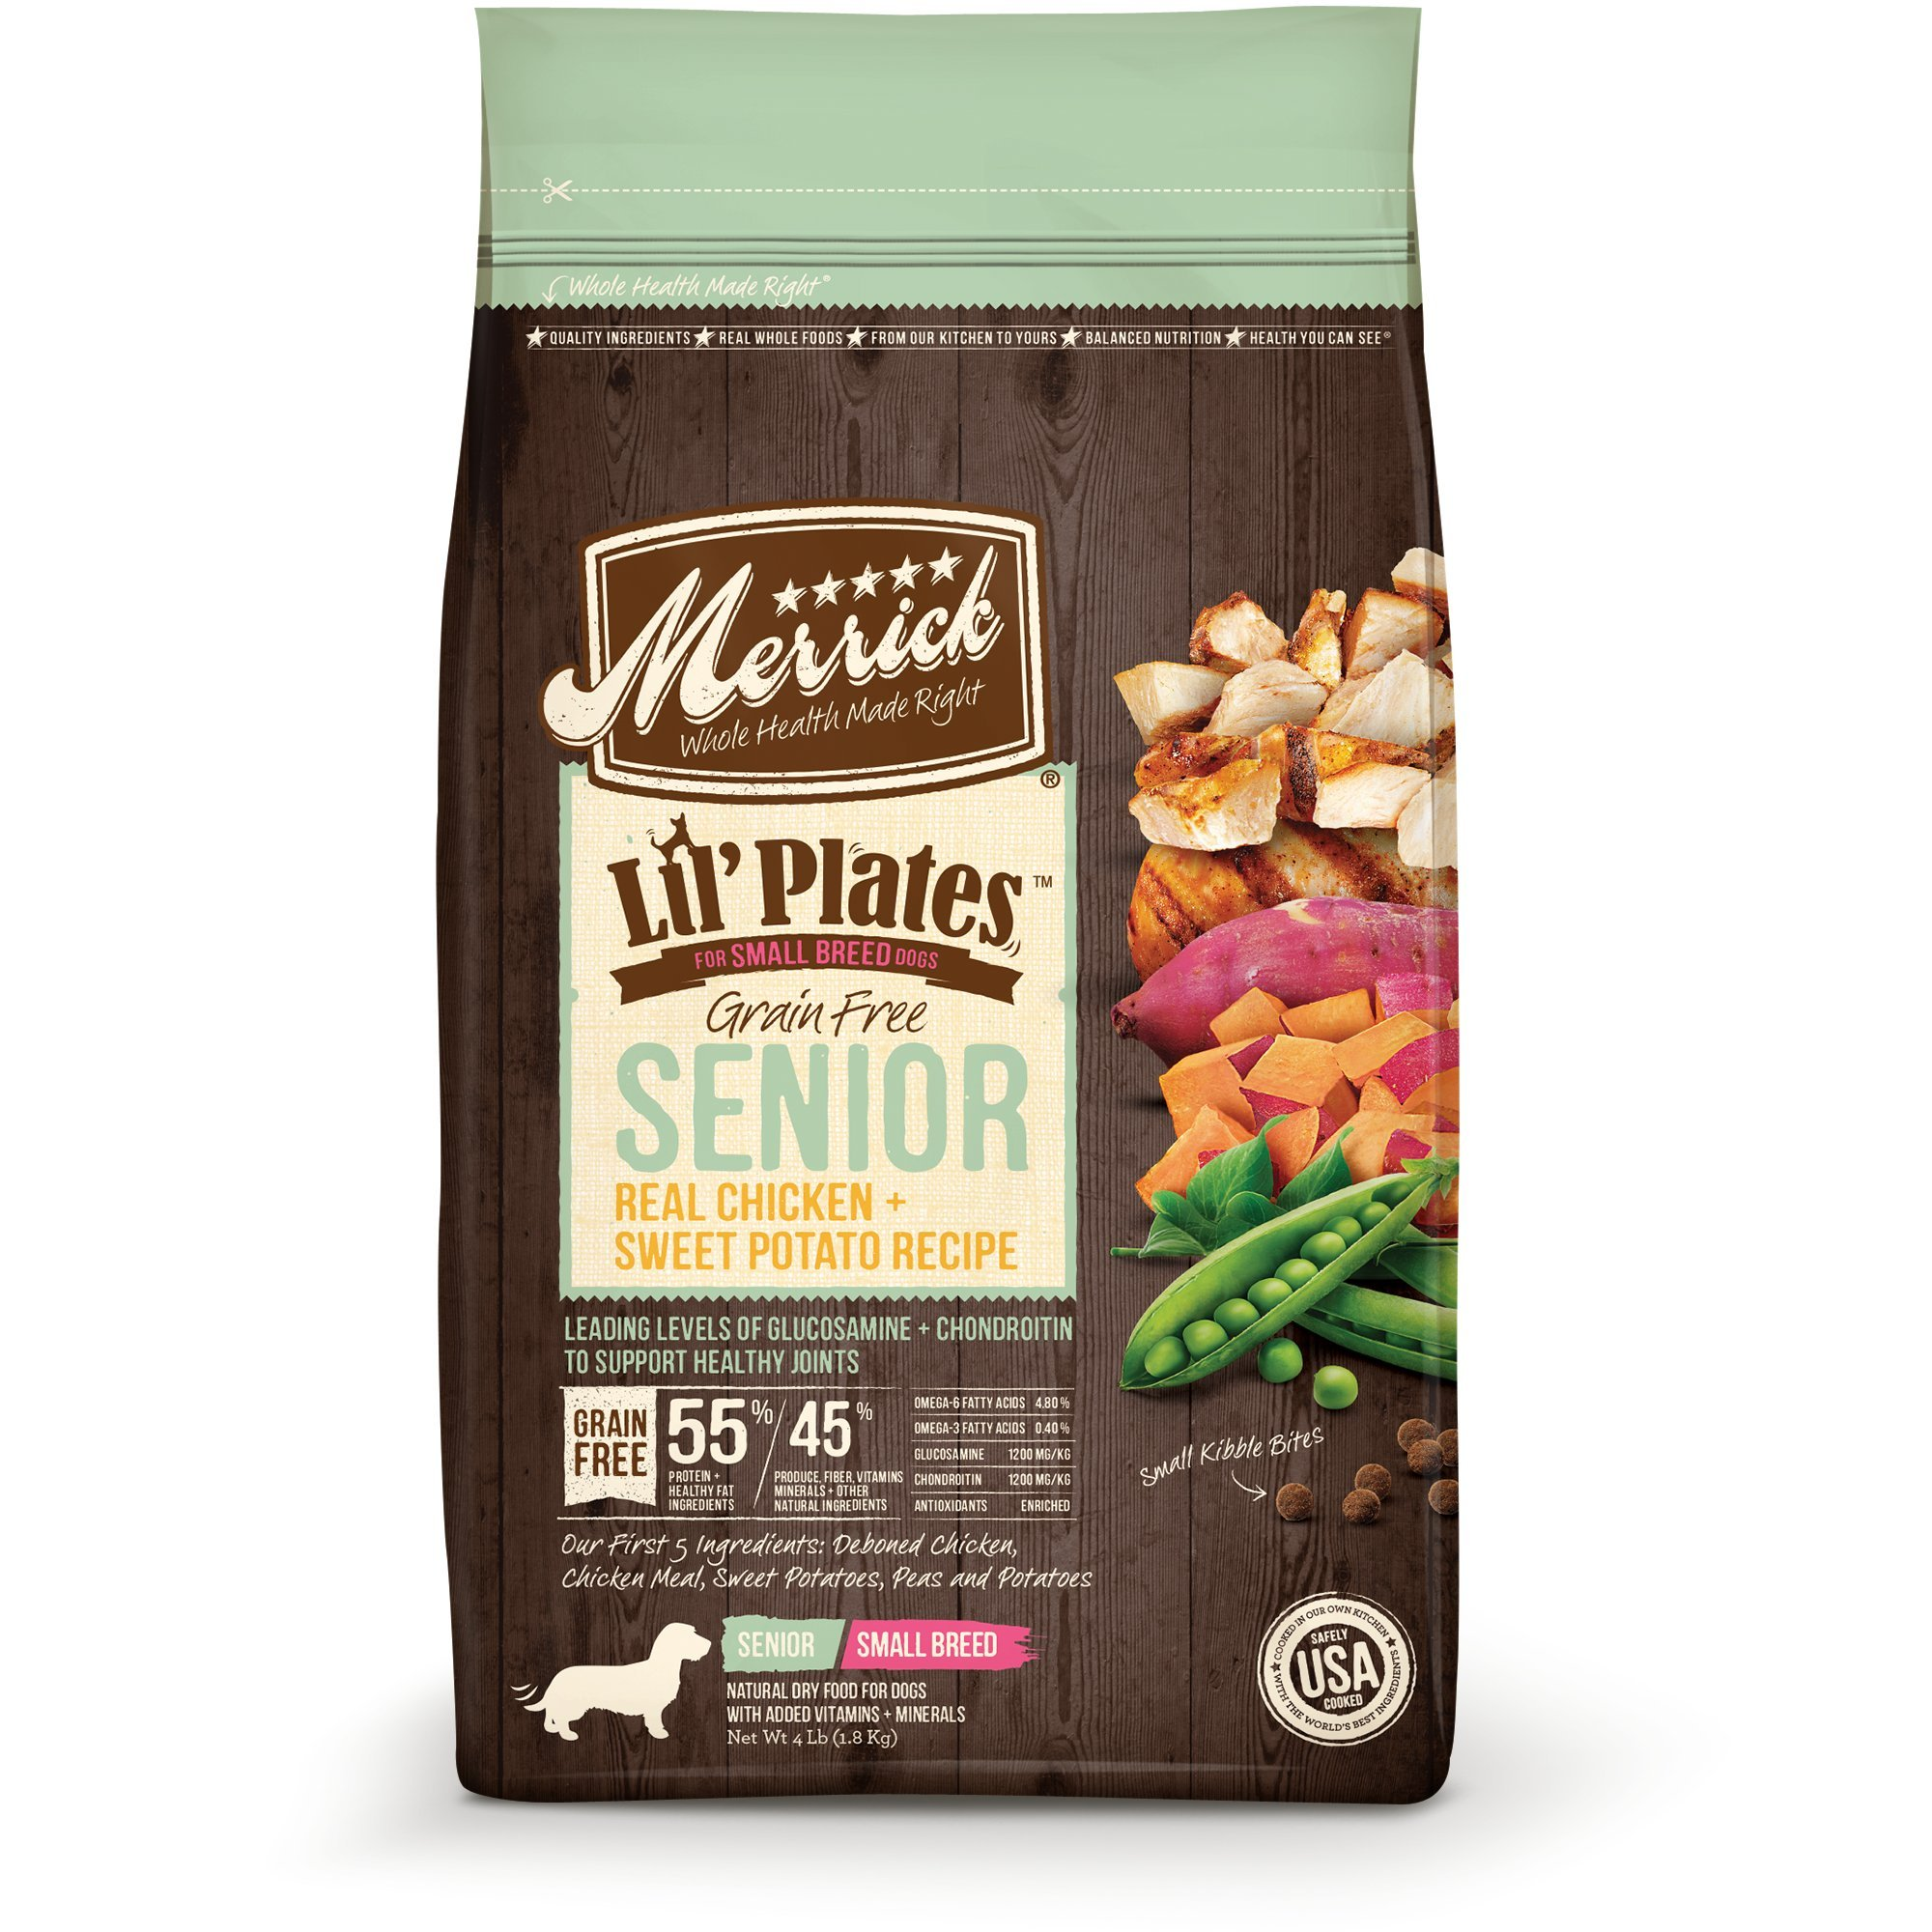 Merrick Lil' Plates Small Breed Grain Free Real Chicken + Sweet Potato Small Breed Senior Dry Dog Food, 4lbs.